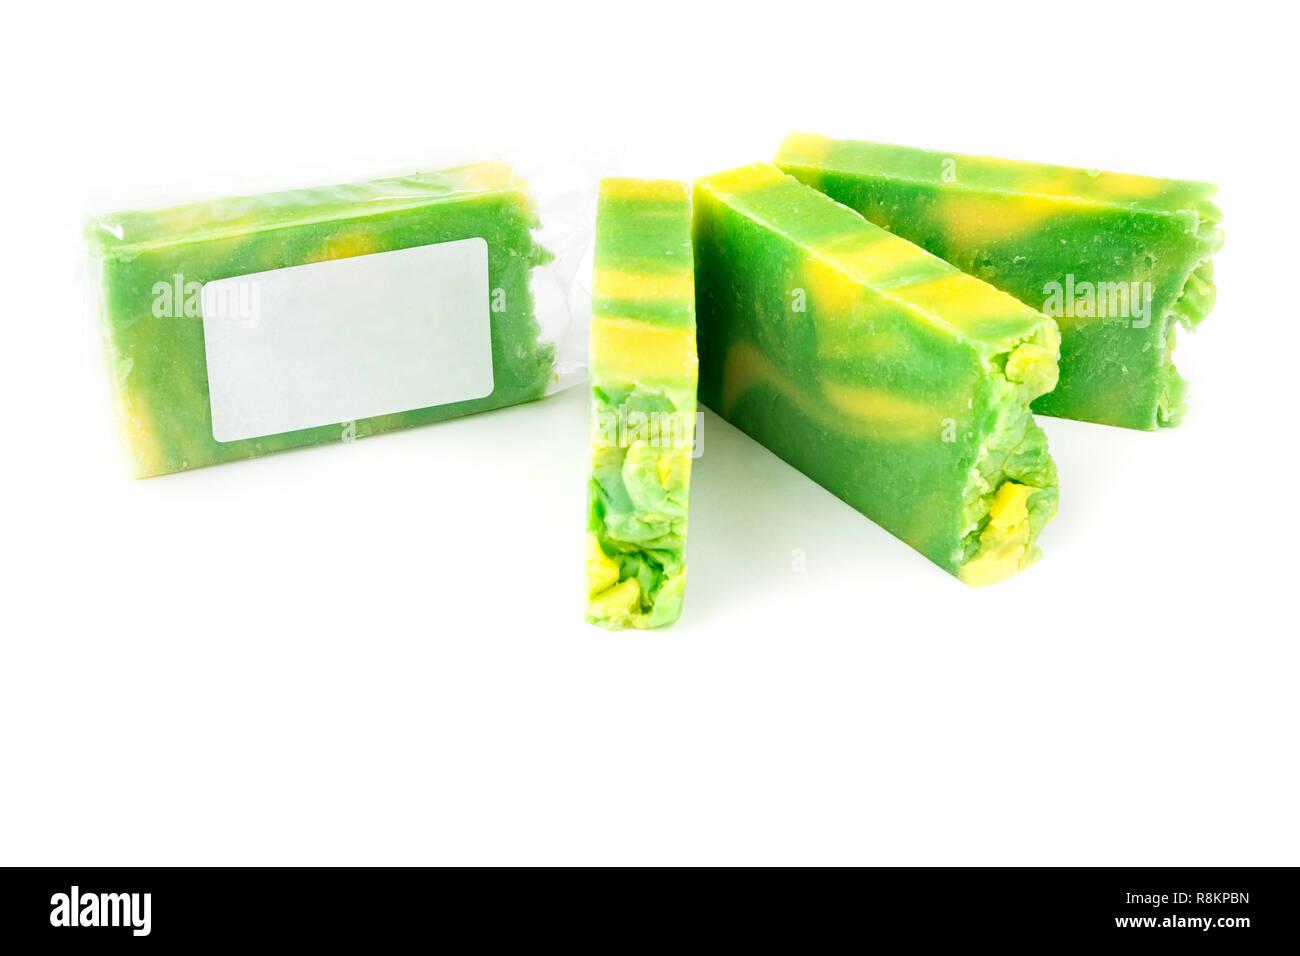 Handmade green and yellow artisan jojoba soap bars on white background - Stock Image